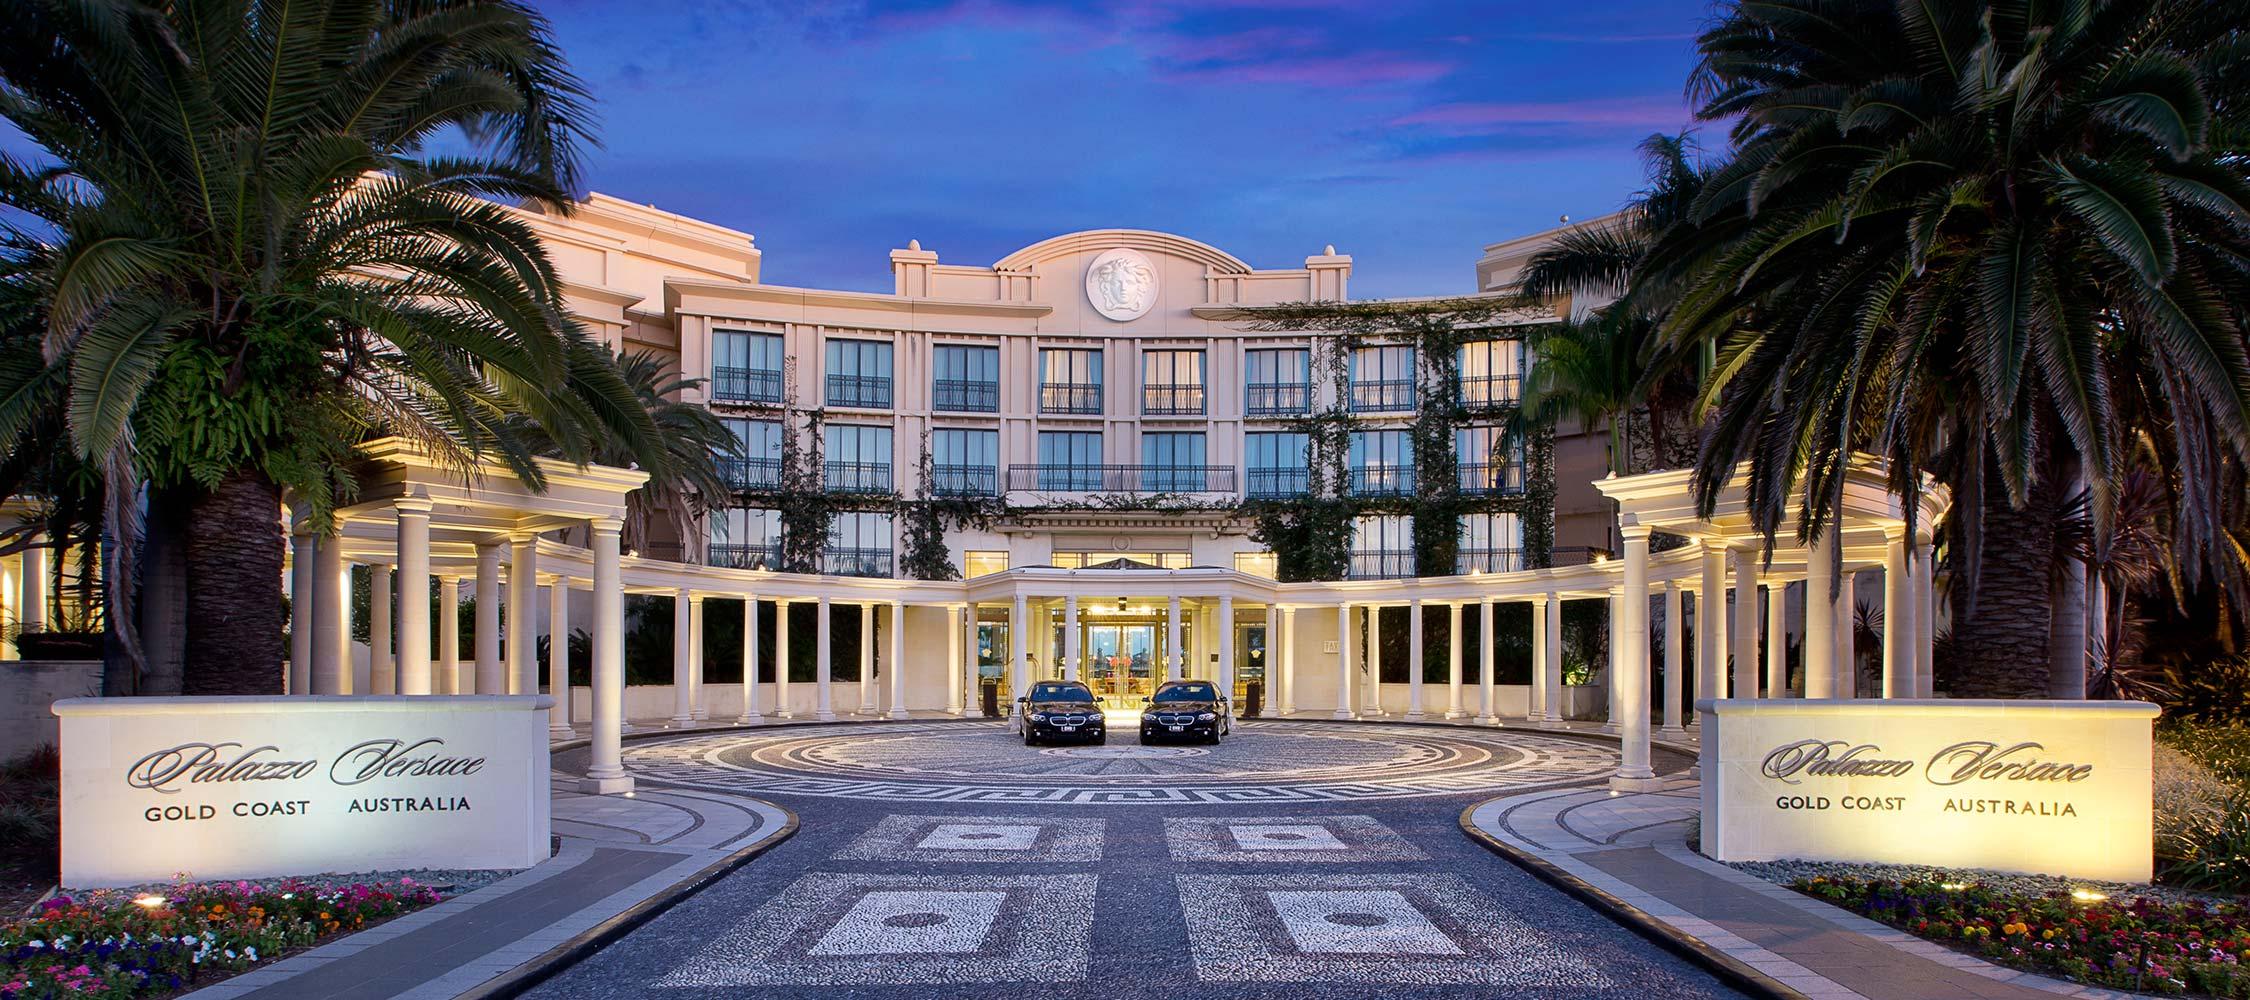 Palazzo Versace Gold Coast. / Foto: Versace